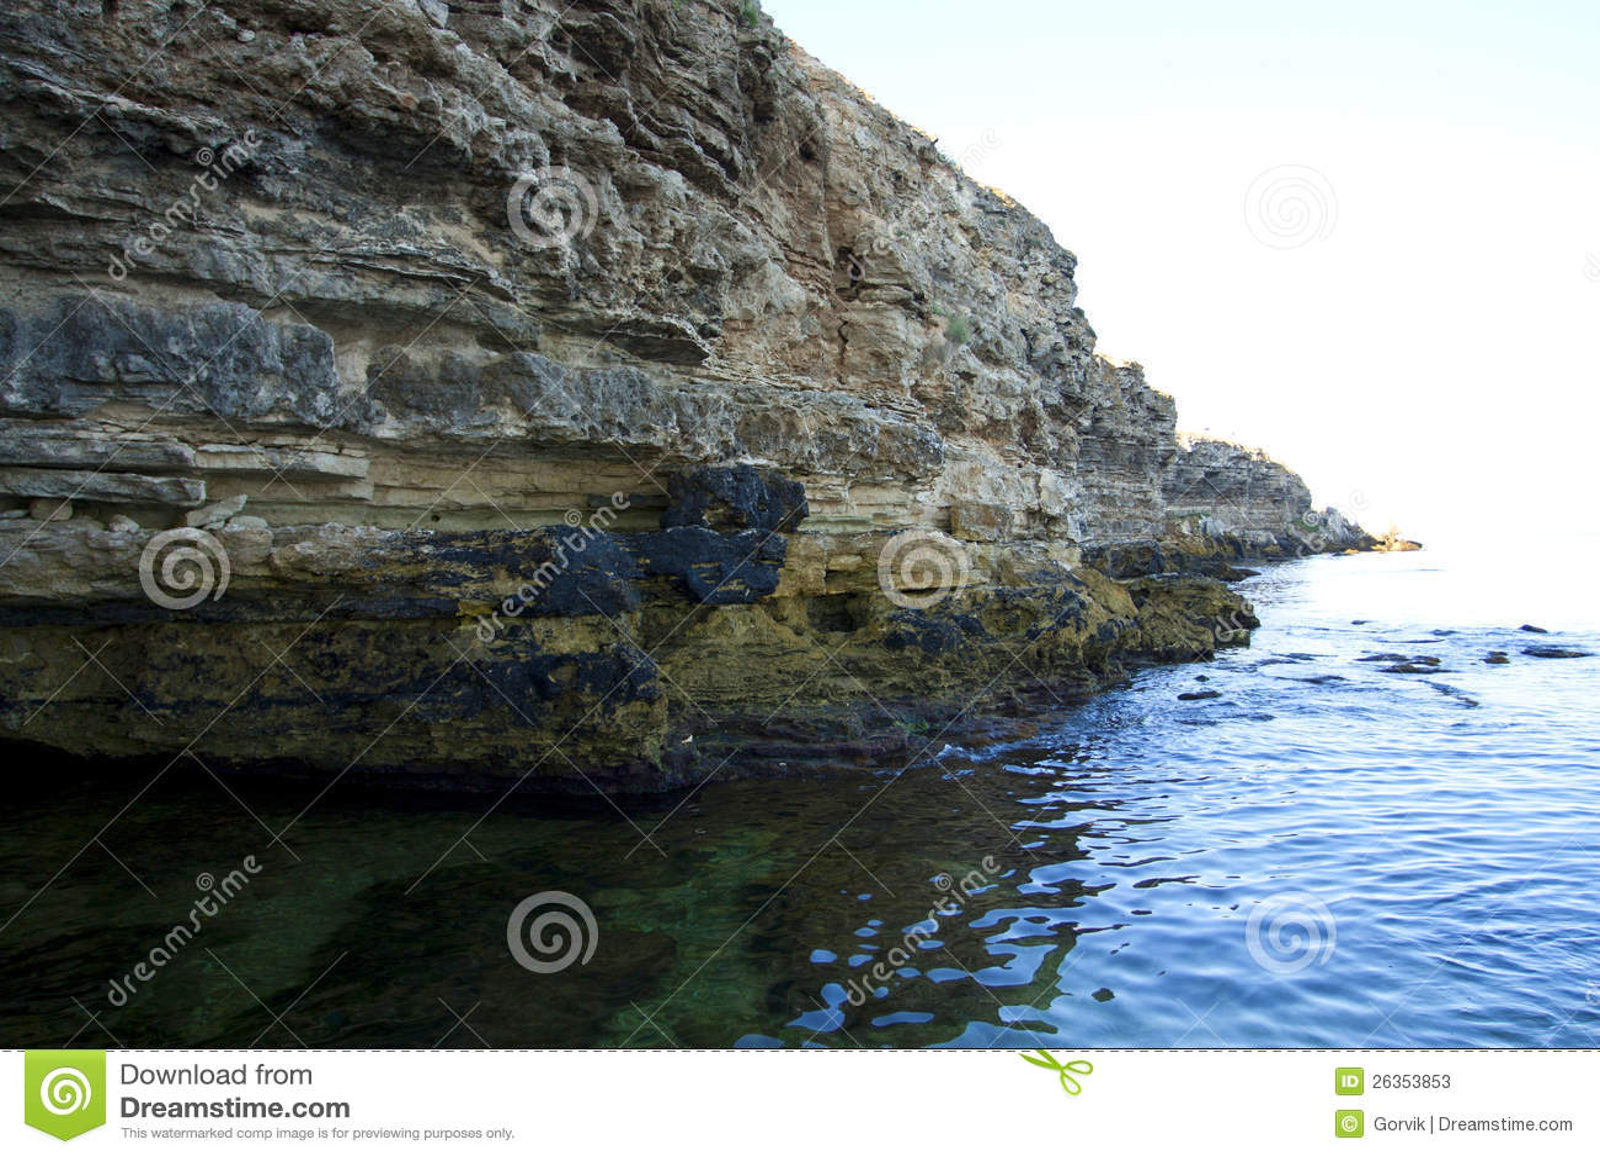 High rocks ashore